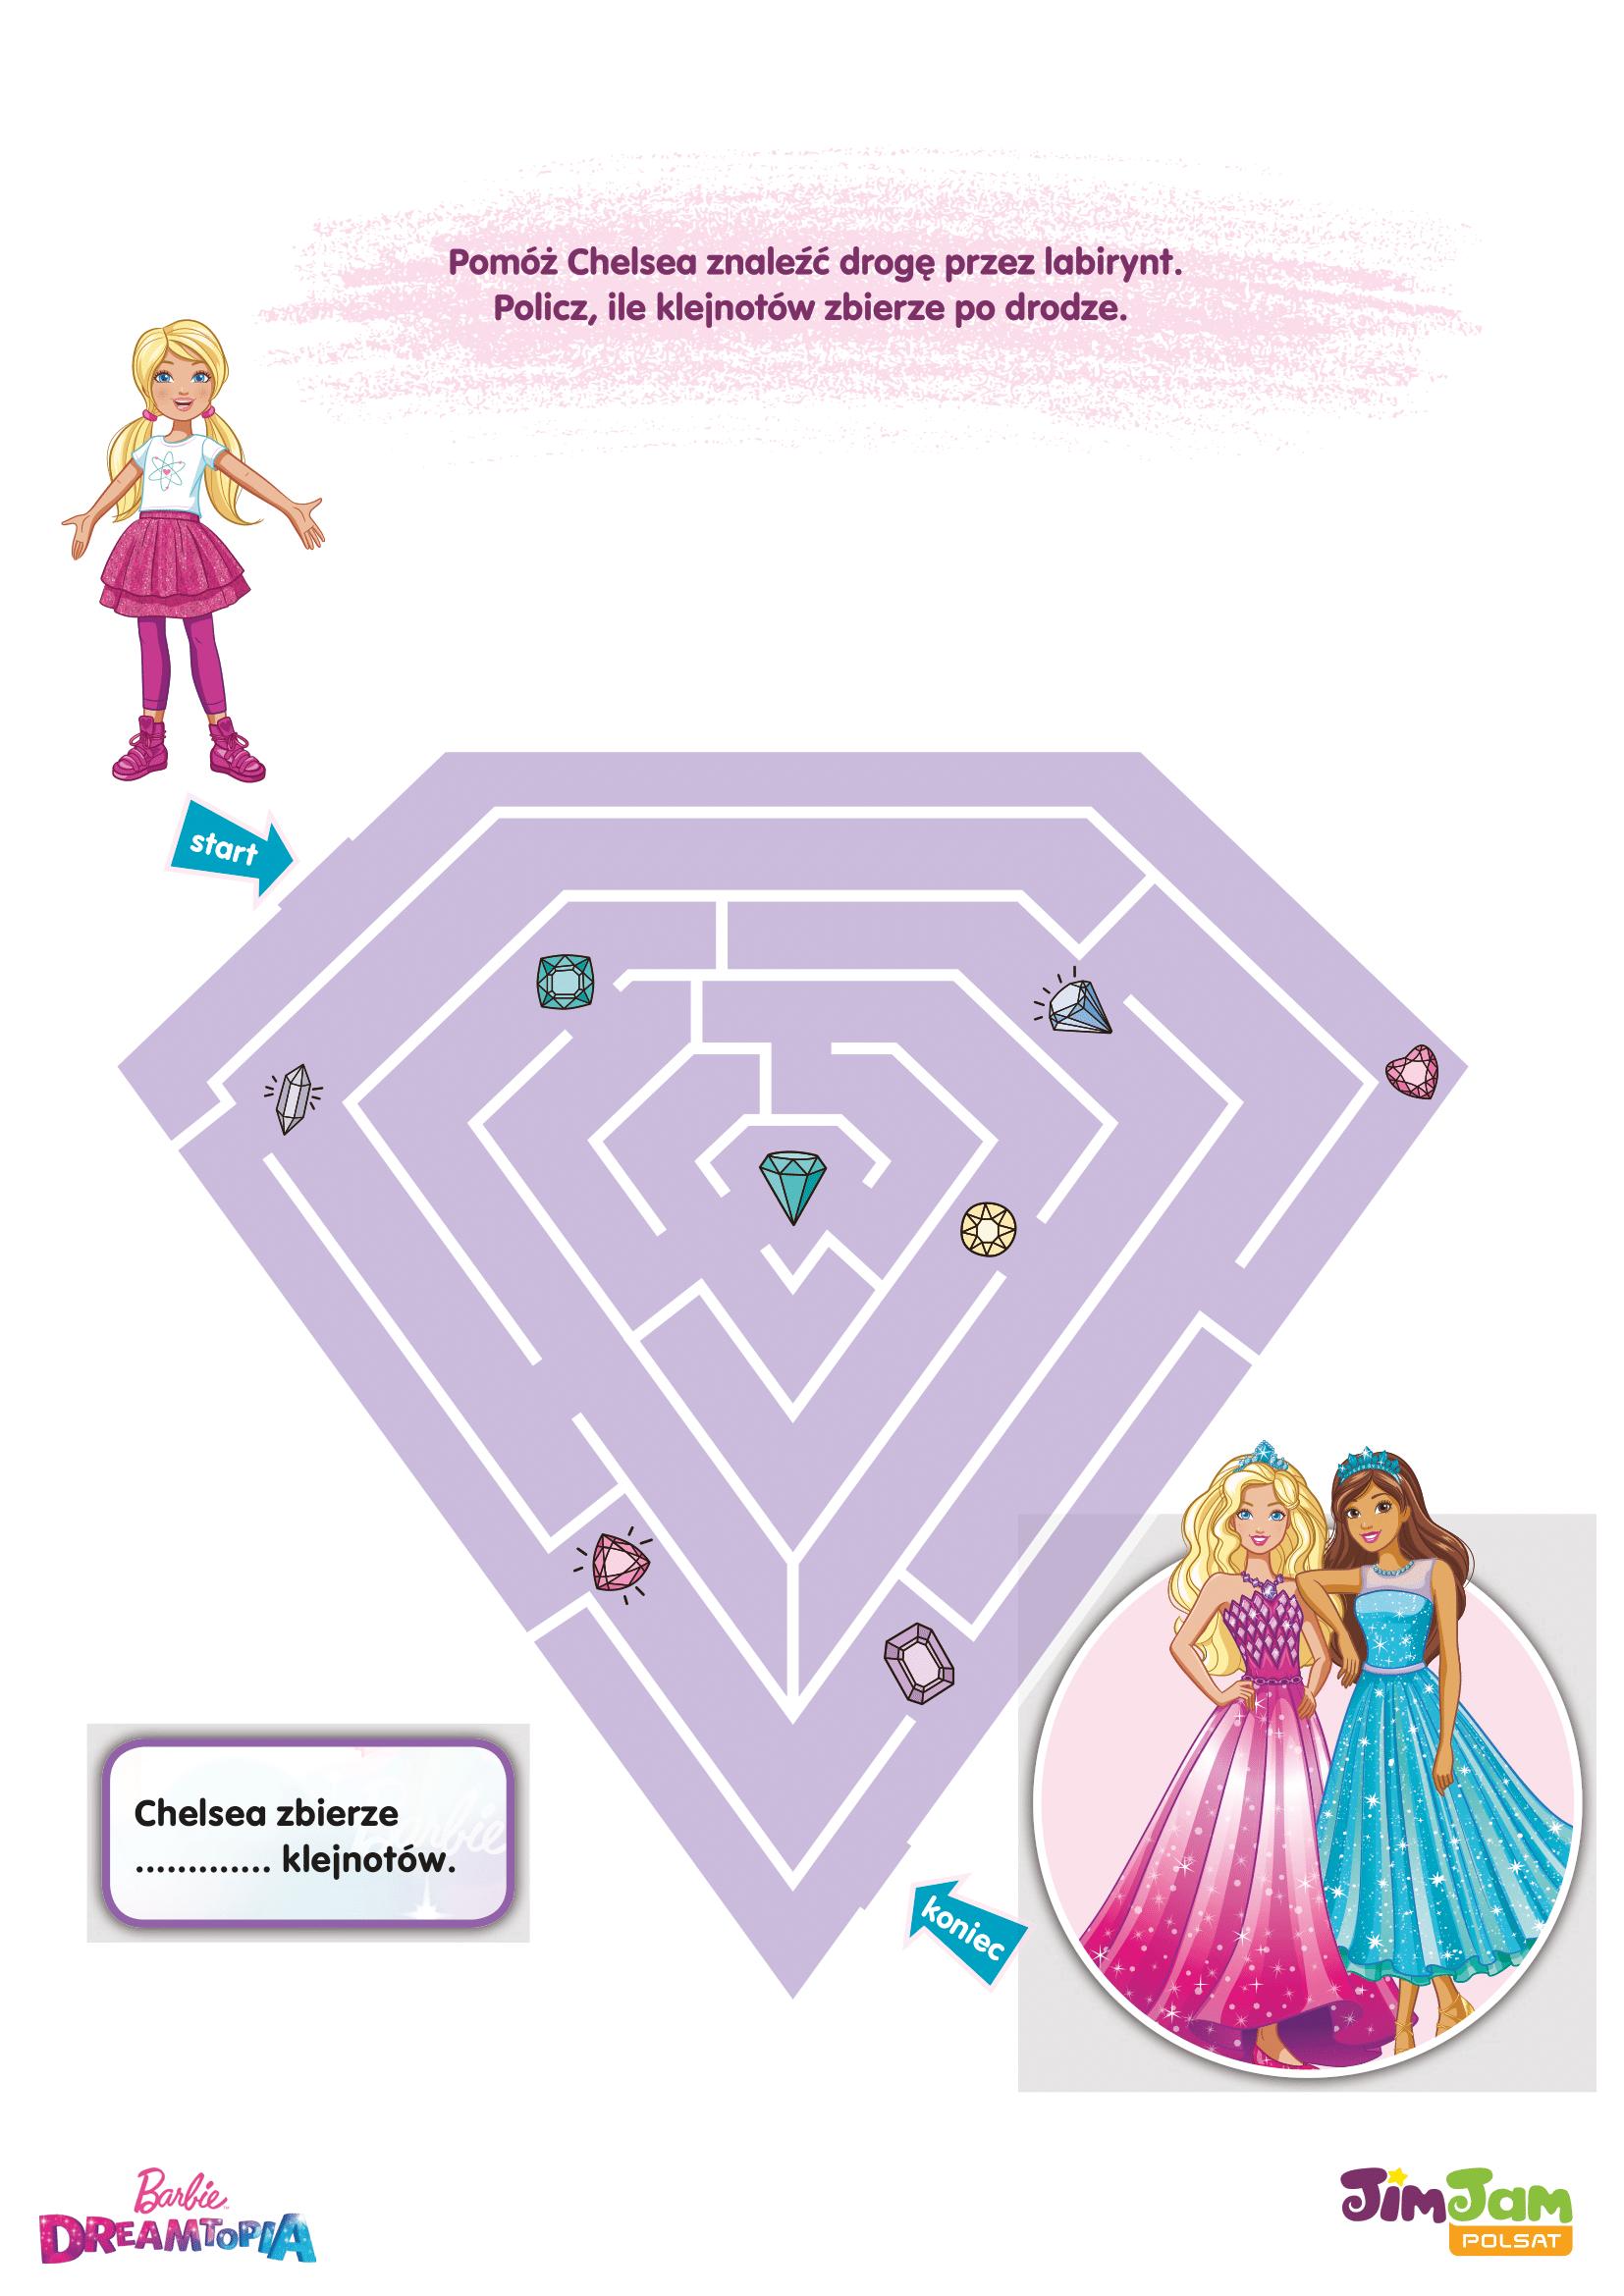 Labirynt Chelsea – Barbie Dreamtopia POLSAT JimJam – karta pracy